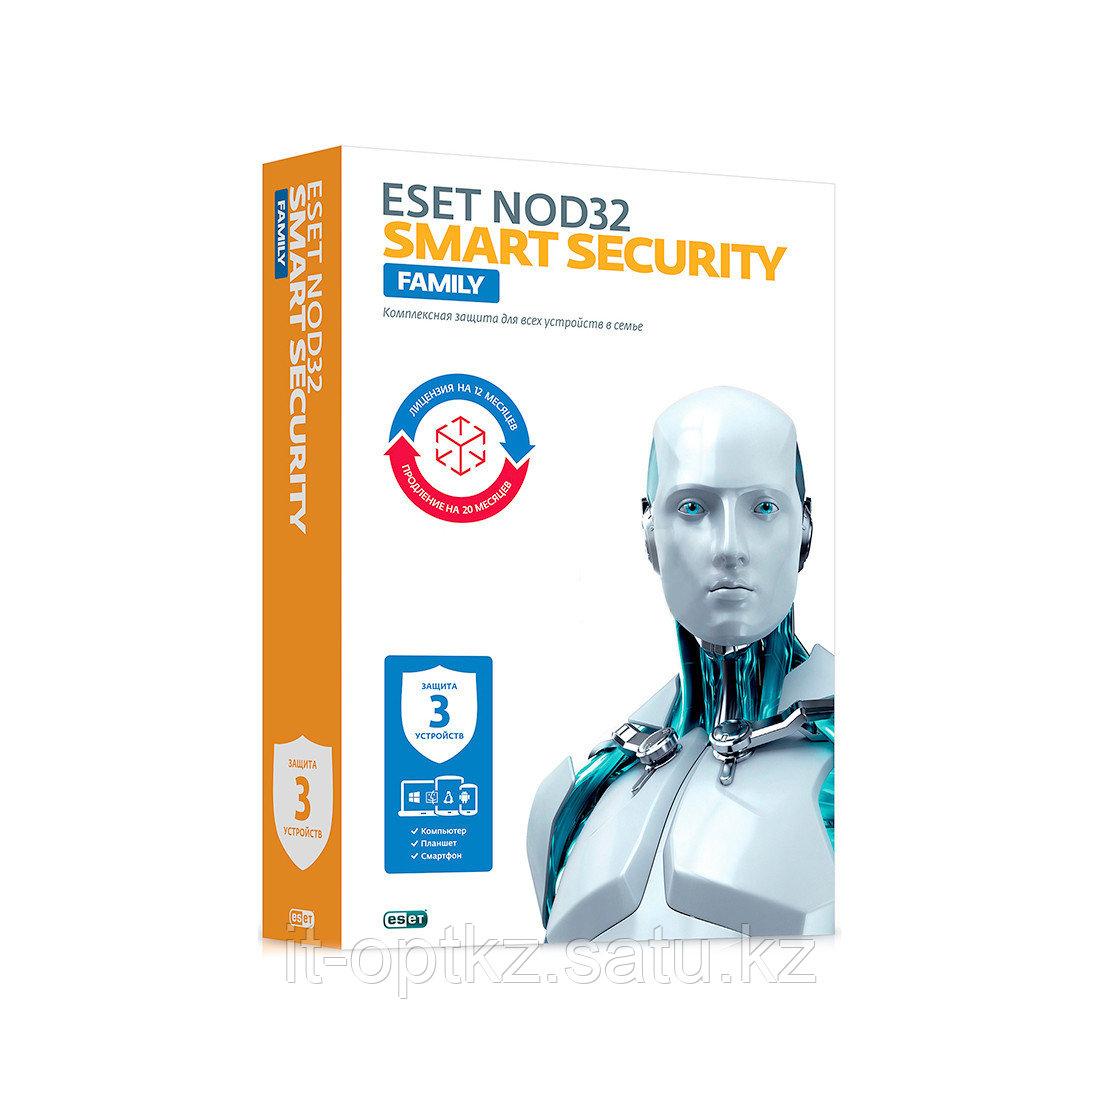 Антивирус Eset NOD32 Smart Security Family 1 год 3 ПК